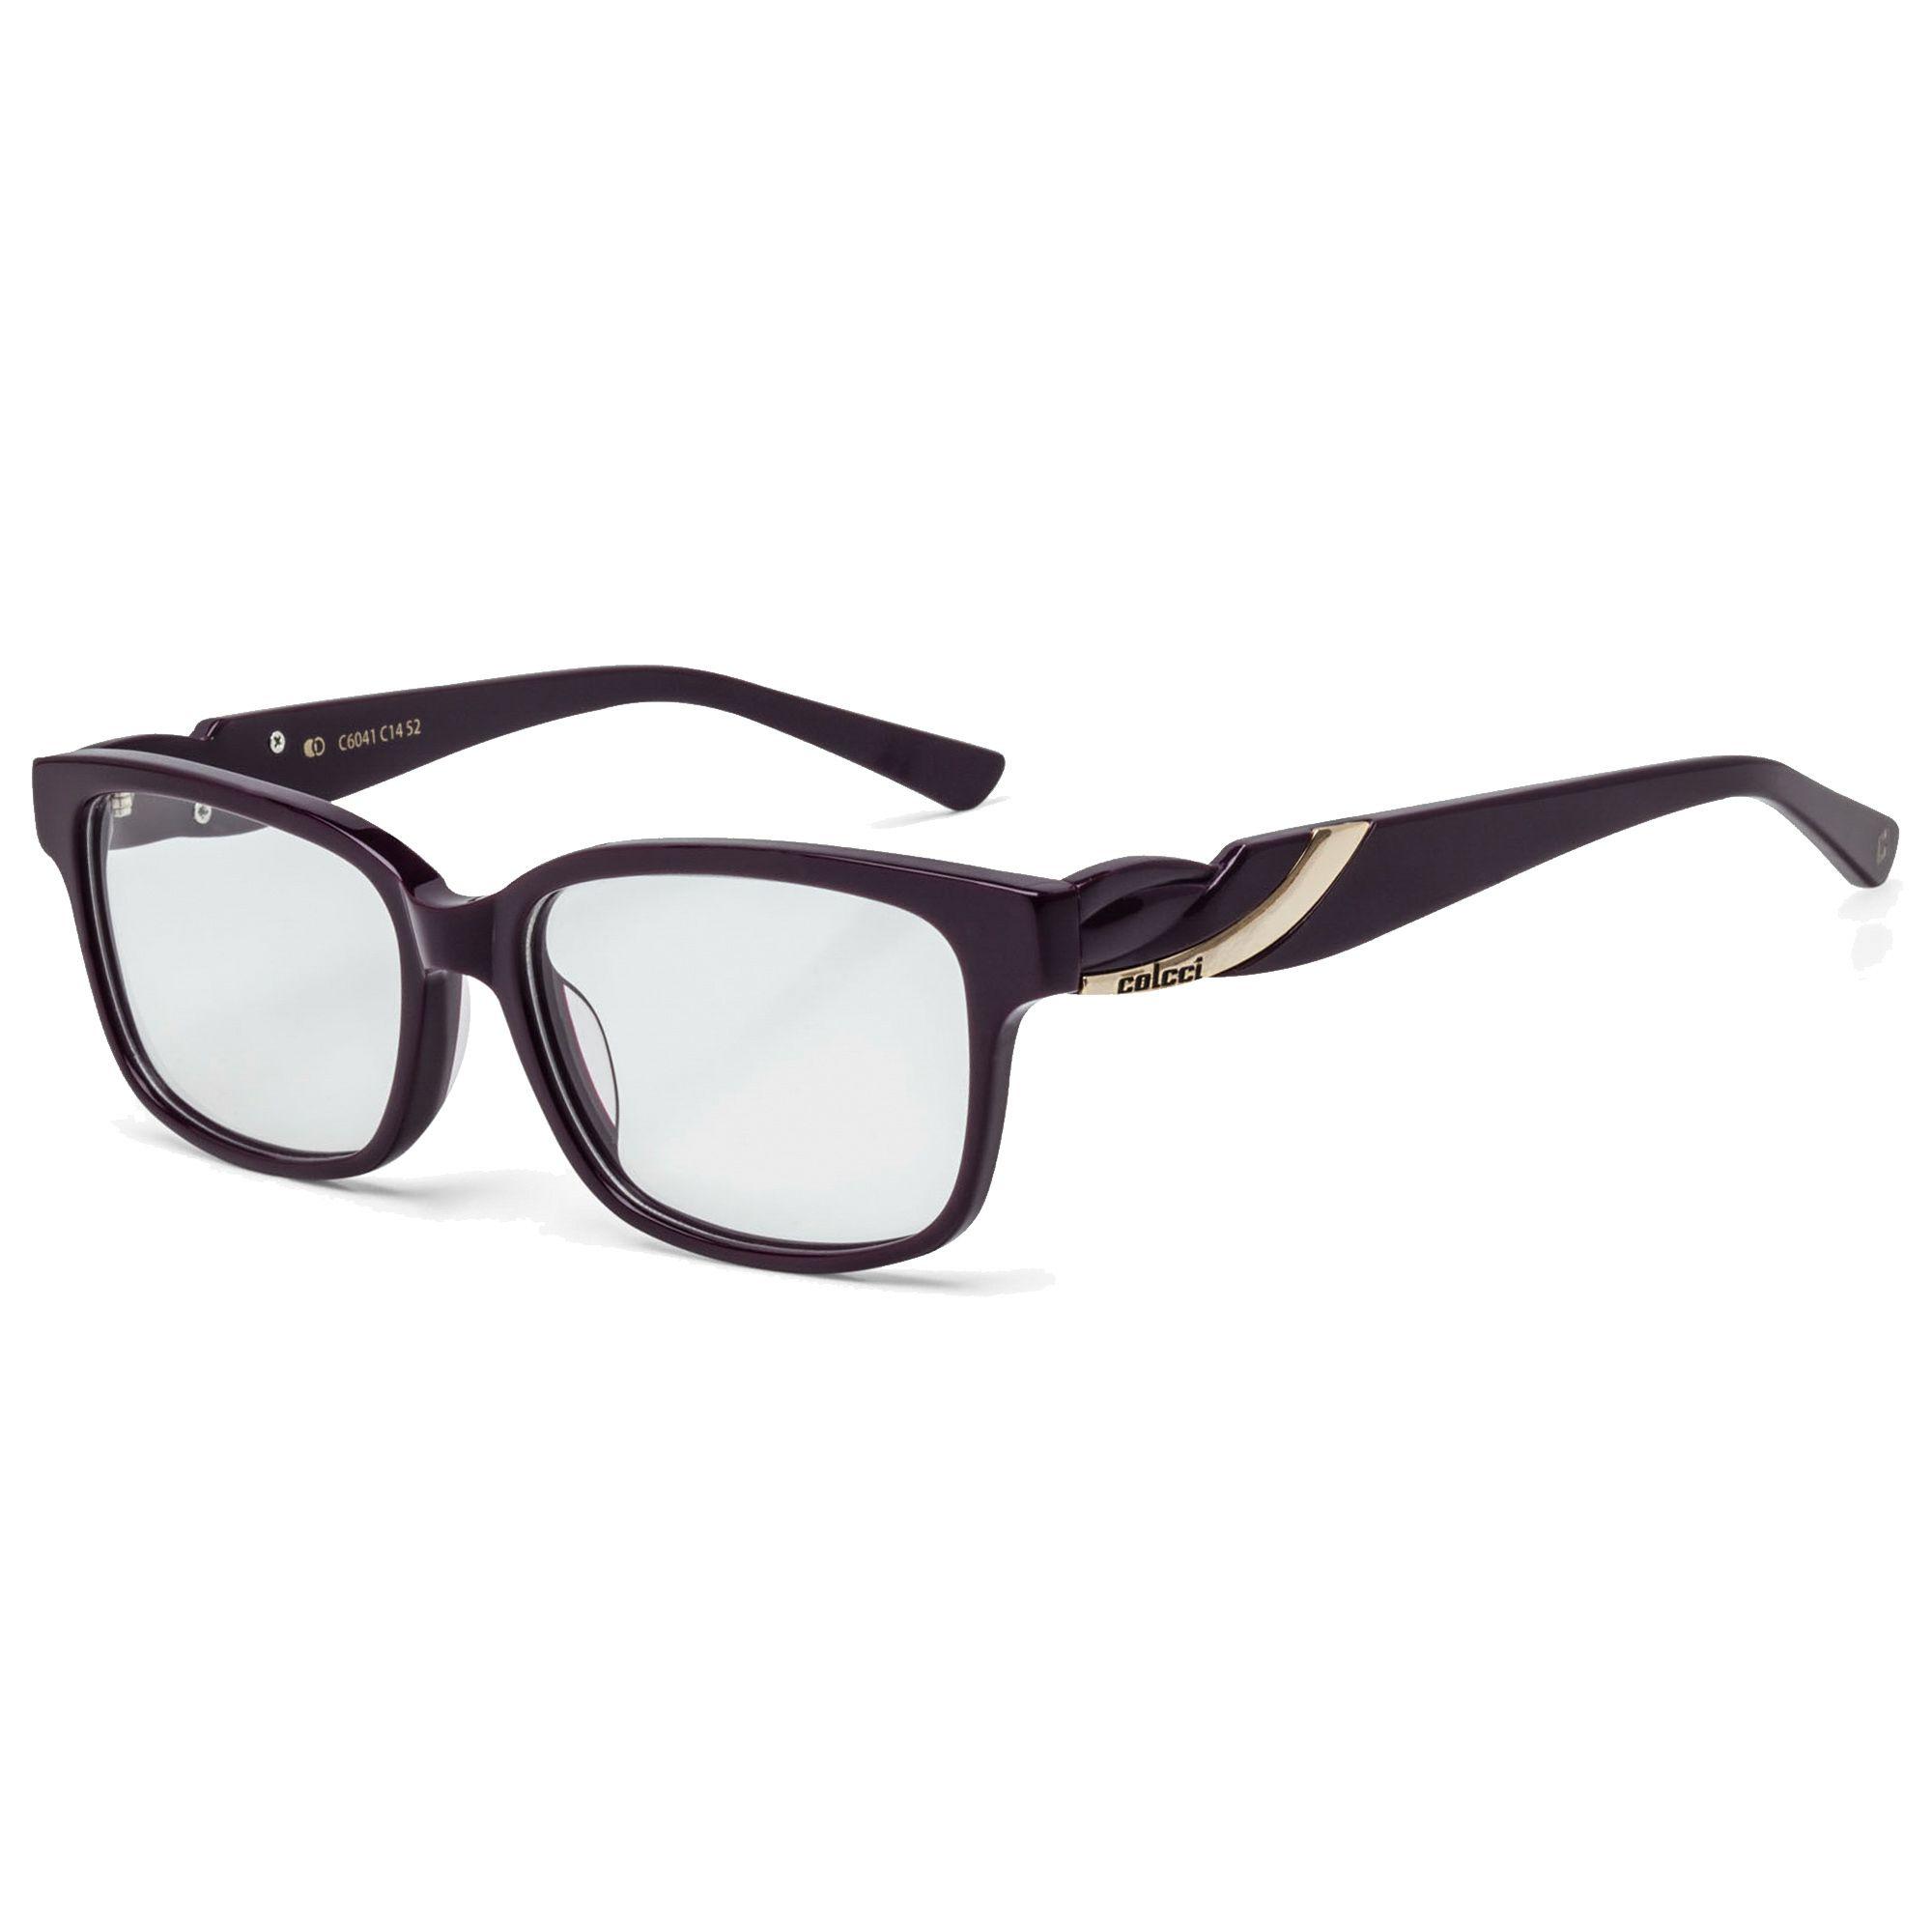 Óculos de Grau Feminino Colcci C6041C1452